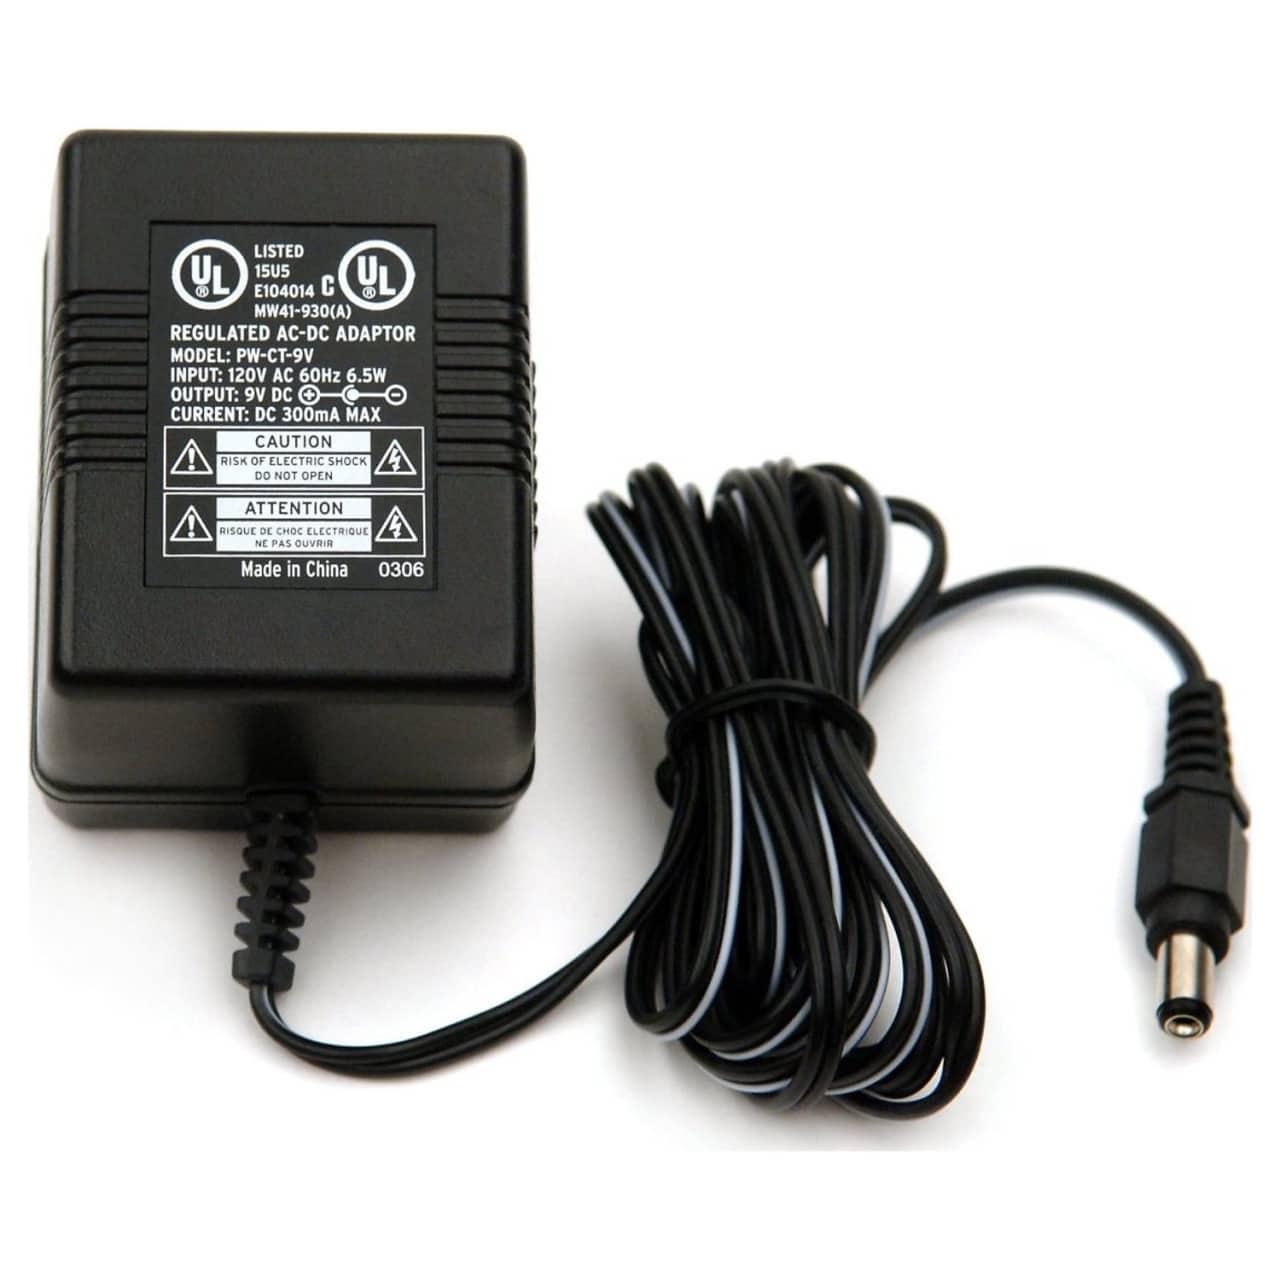 daddario 9v dc center negative 300ma power supply reverb. Black Bedroom Furniture Sets. Home Design Ideas